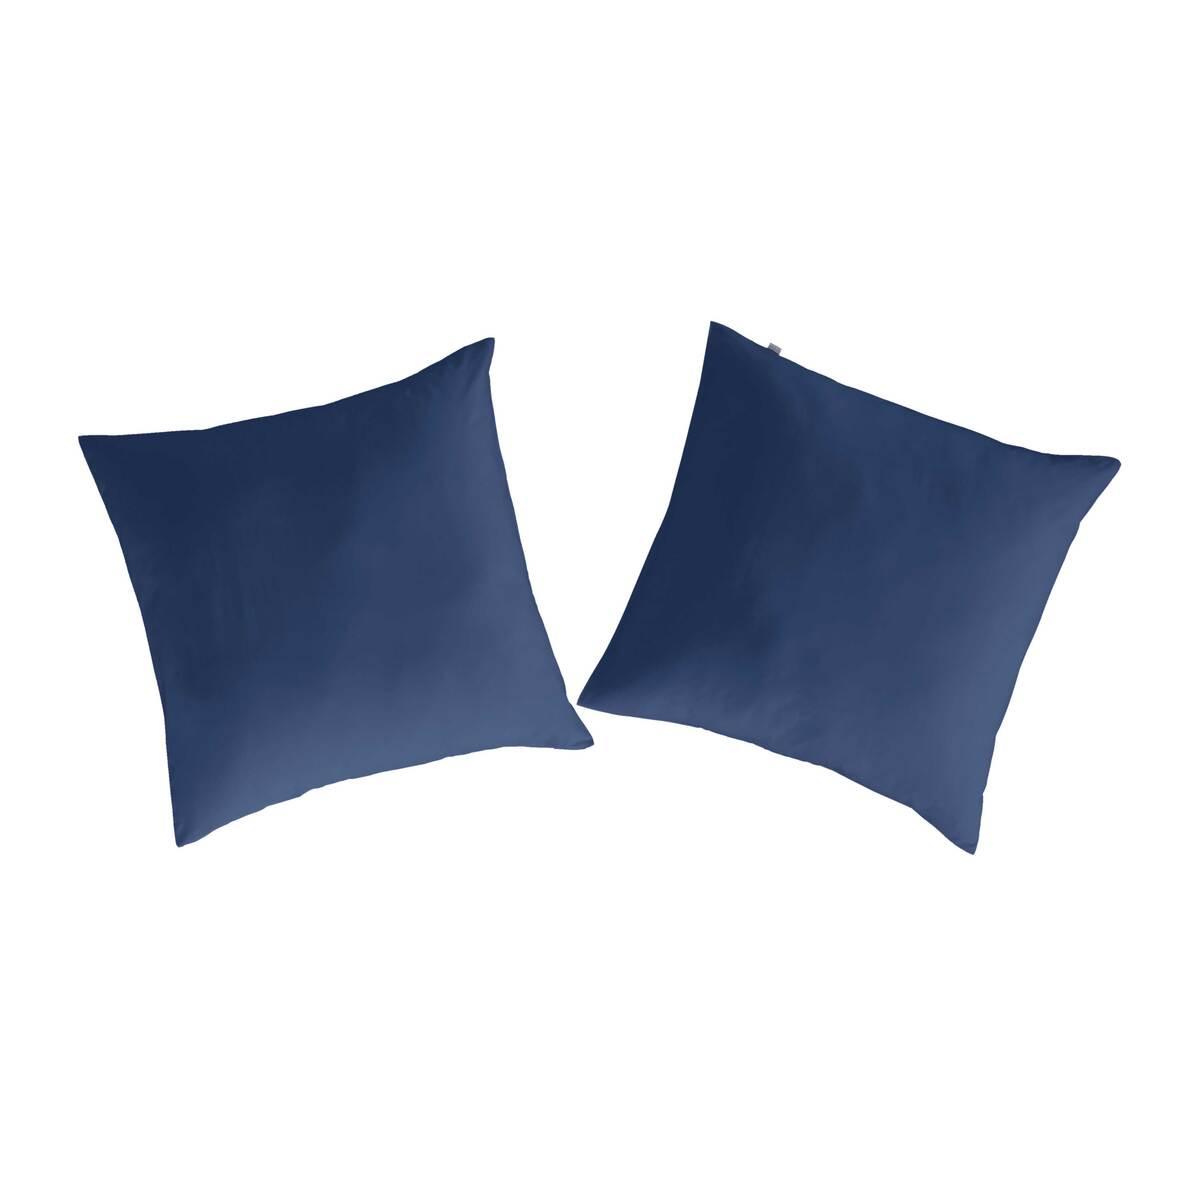 2 taies d'oreiller en coton bleu marine 80x80